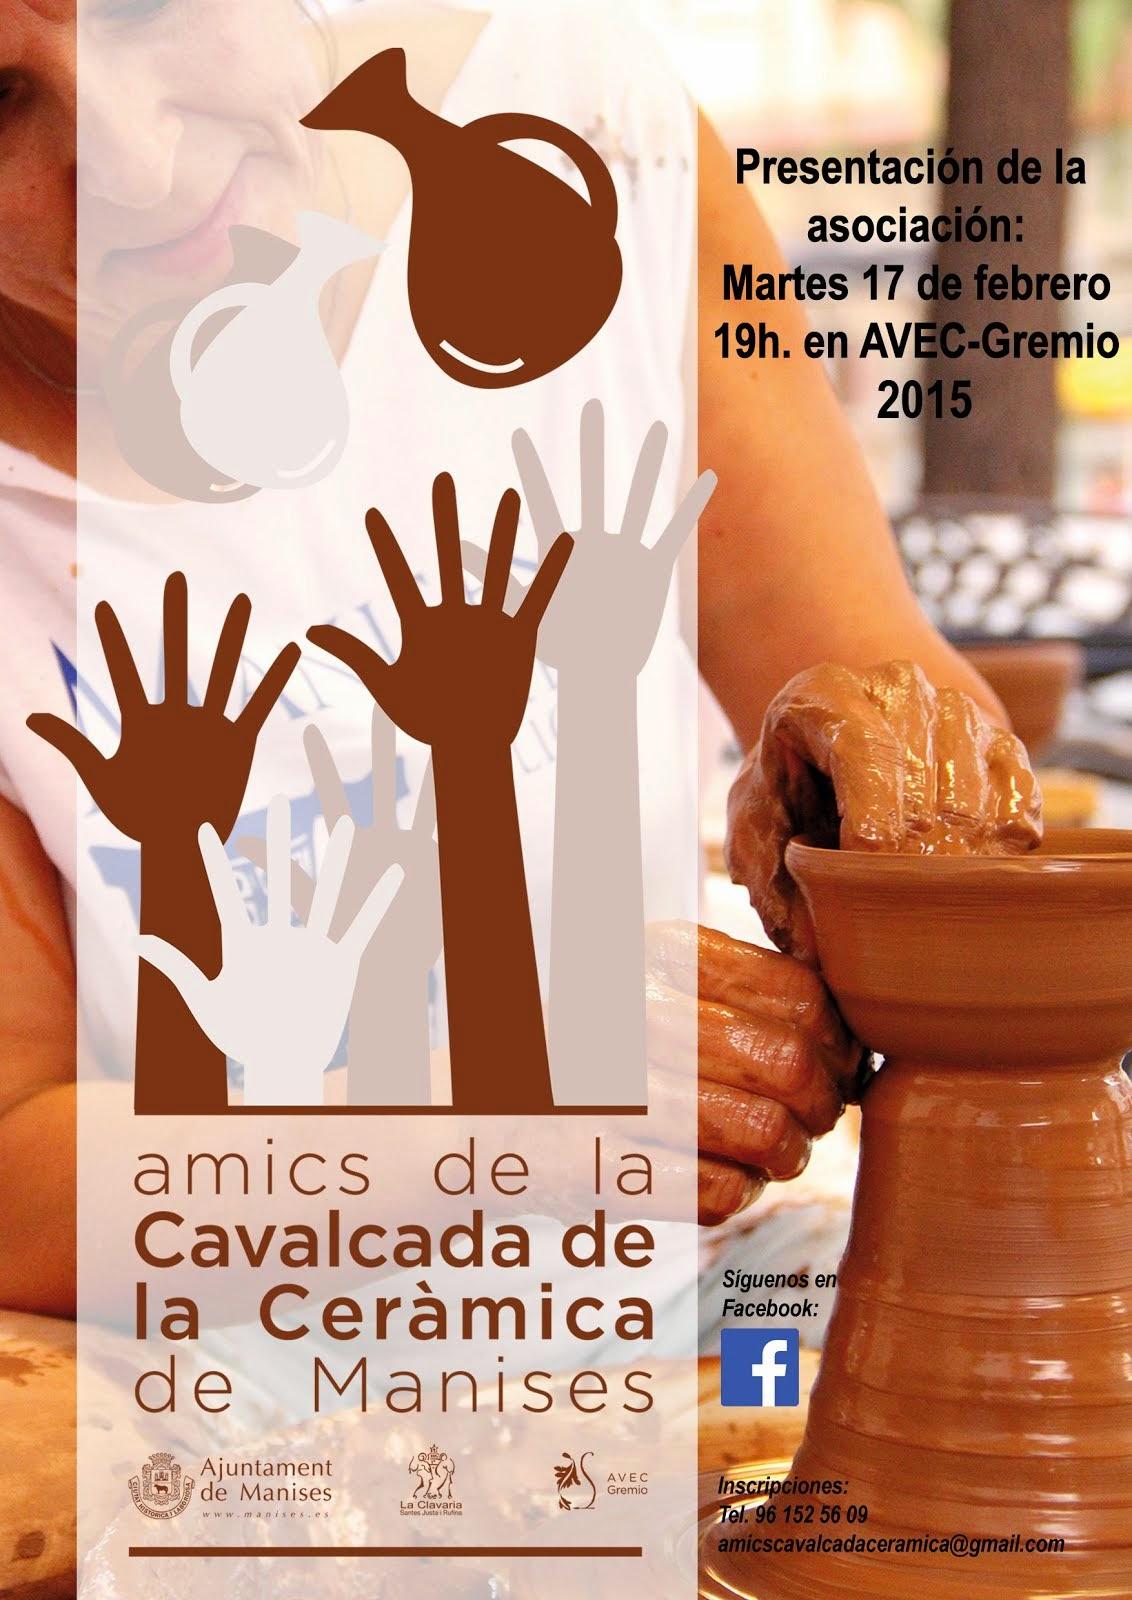 PRESENTACIÓN DE LA ASOC. AMICS DE LA CAVALCADA DE LA CERÀMICA DE MANISES